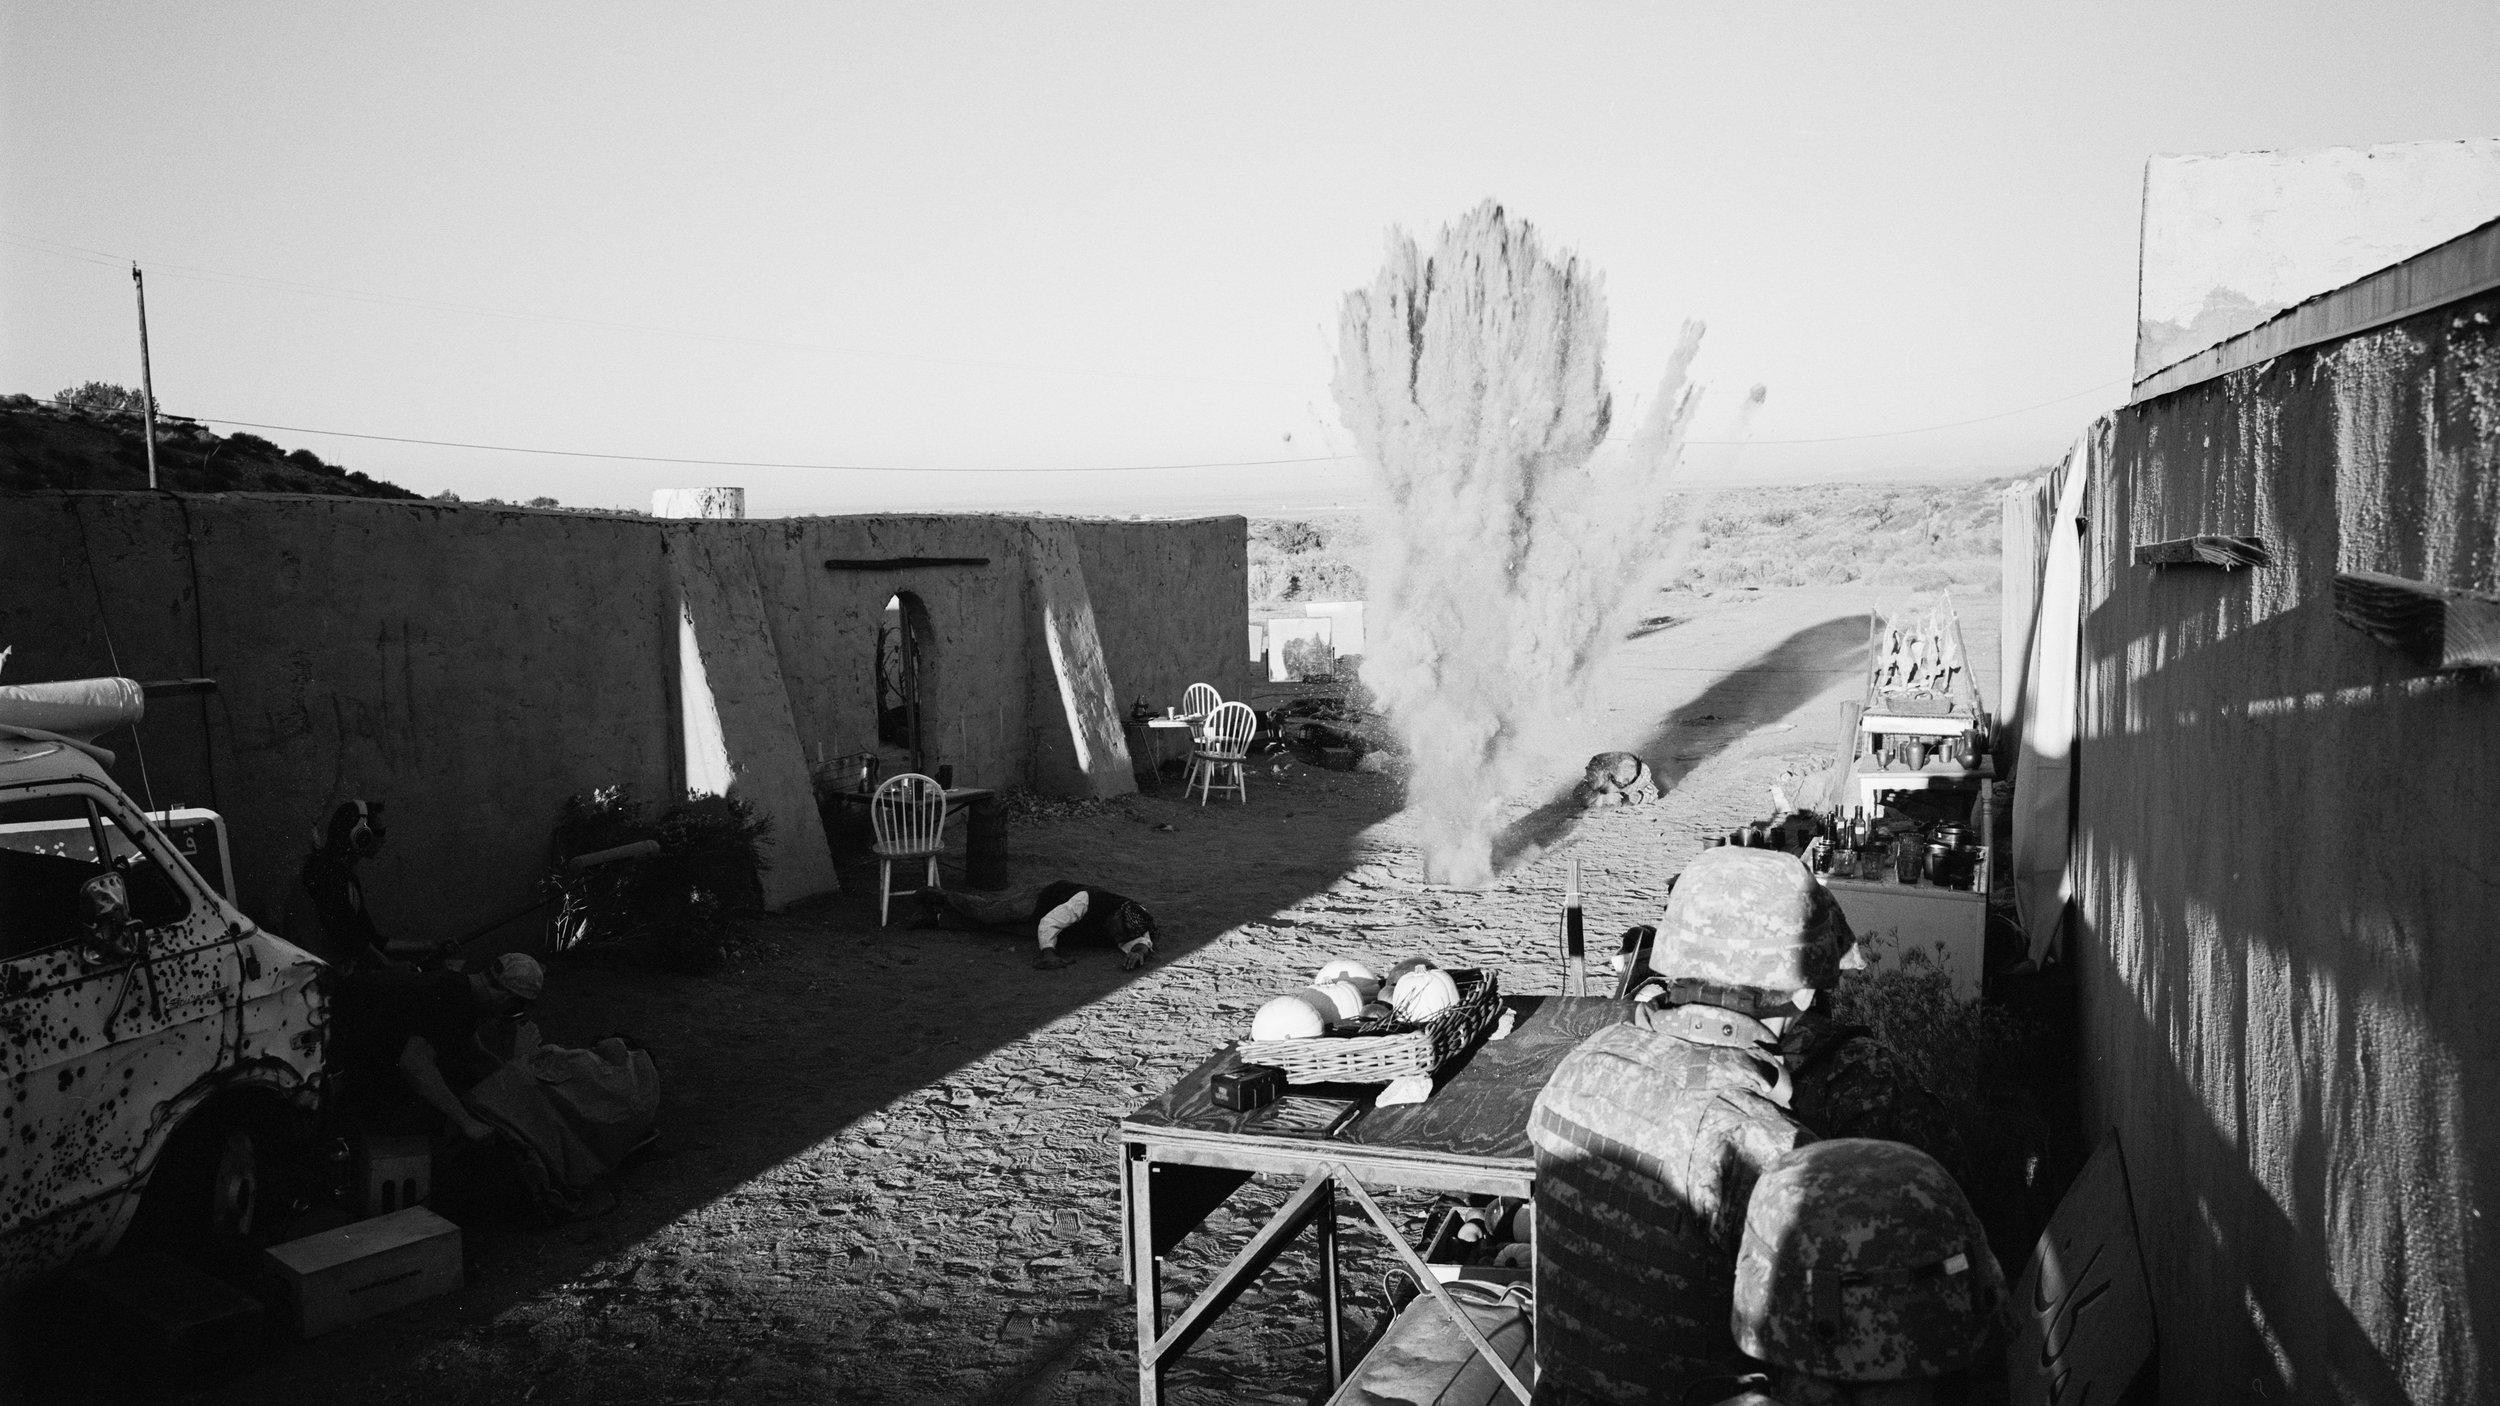 Fort Irwin_37.jpg